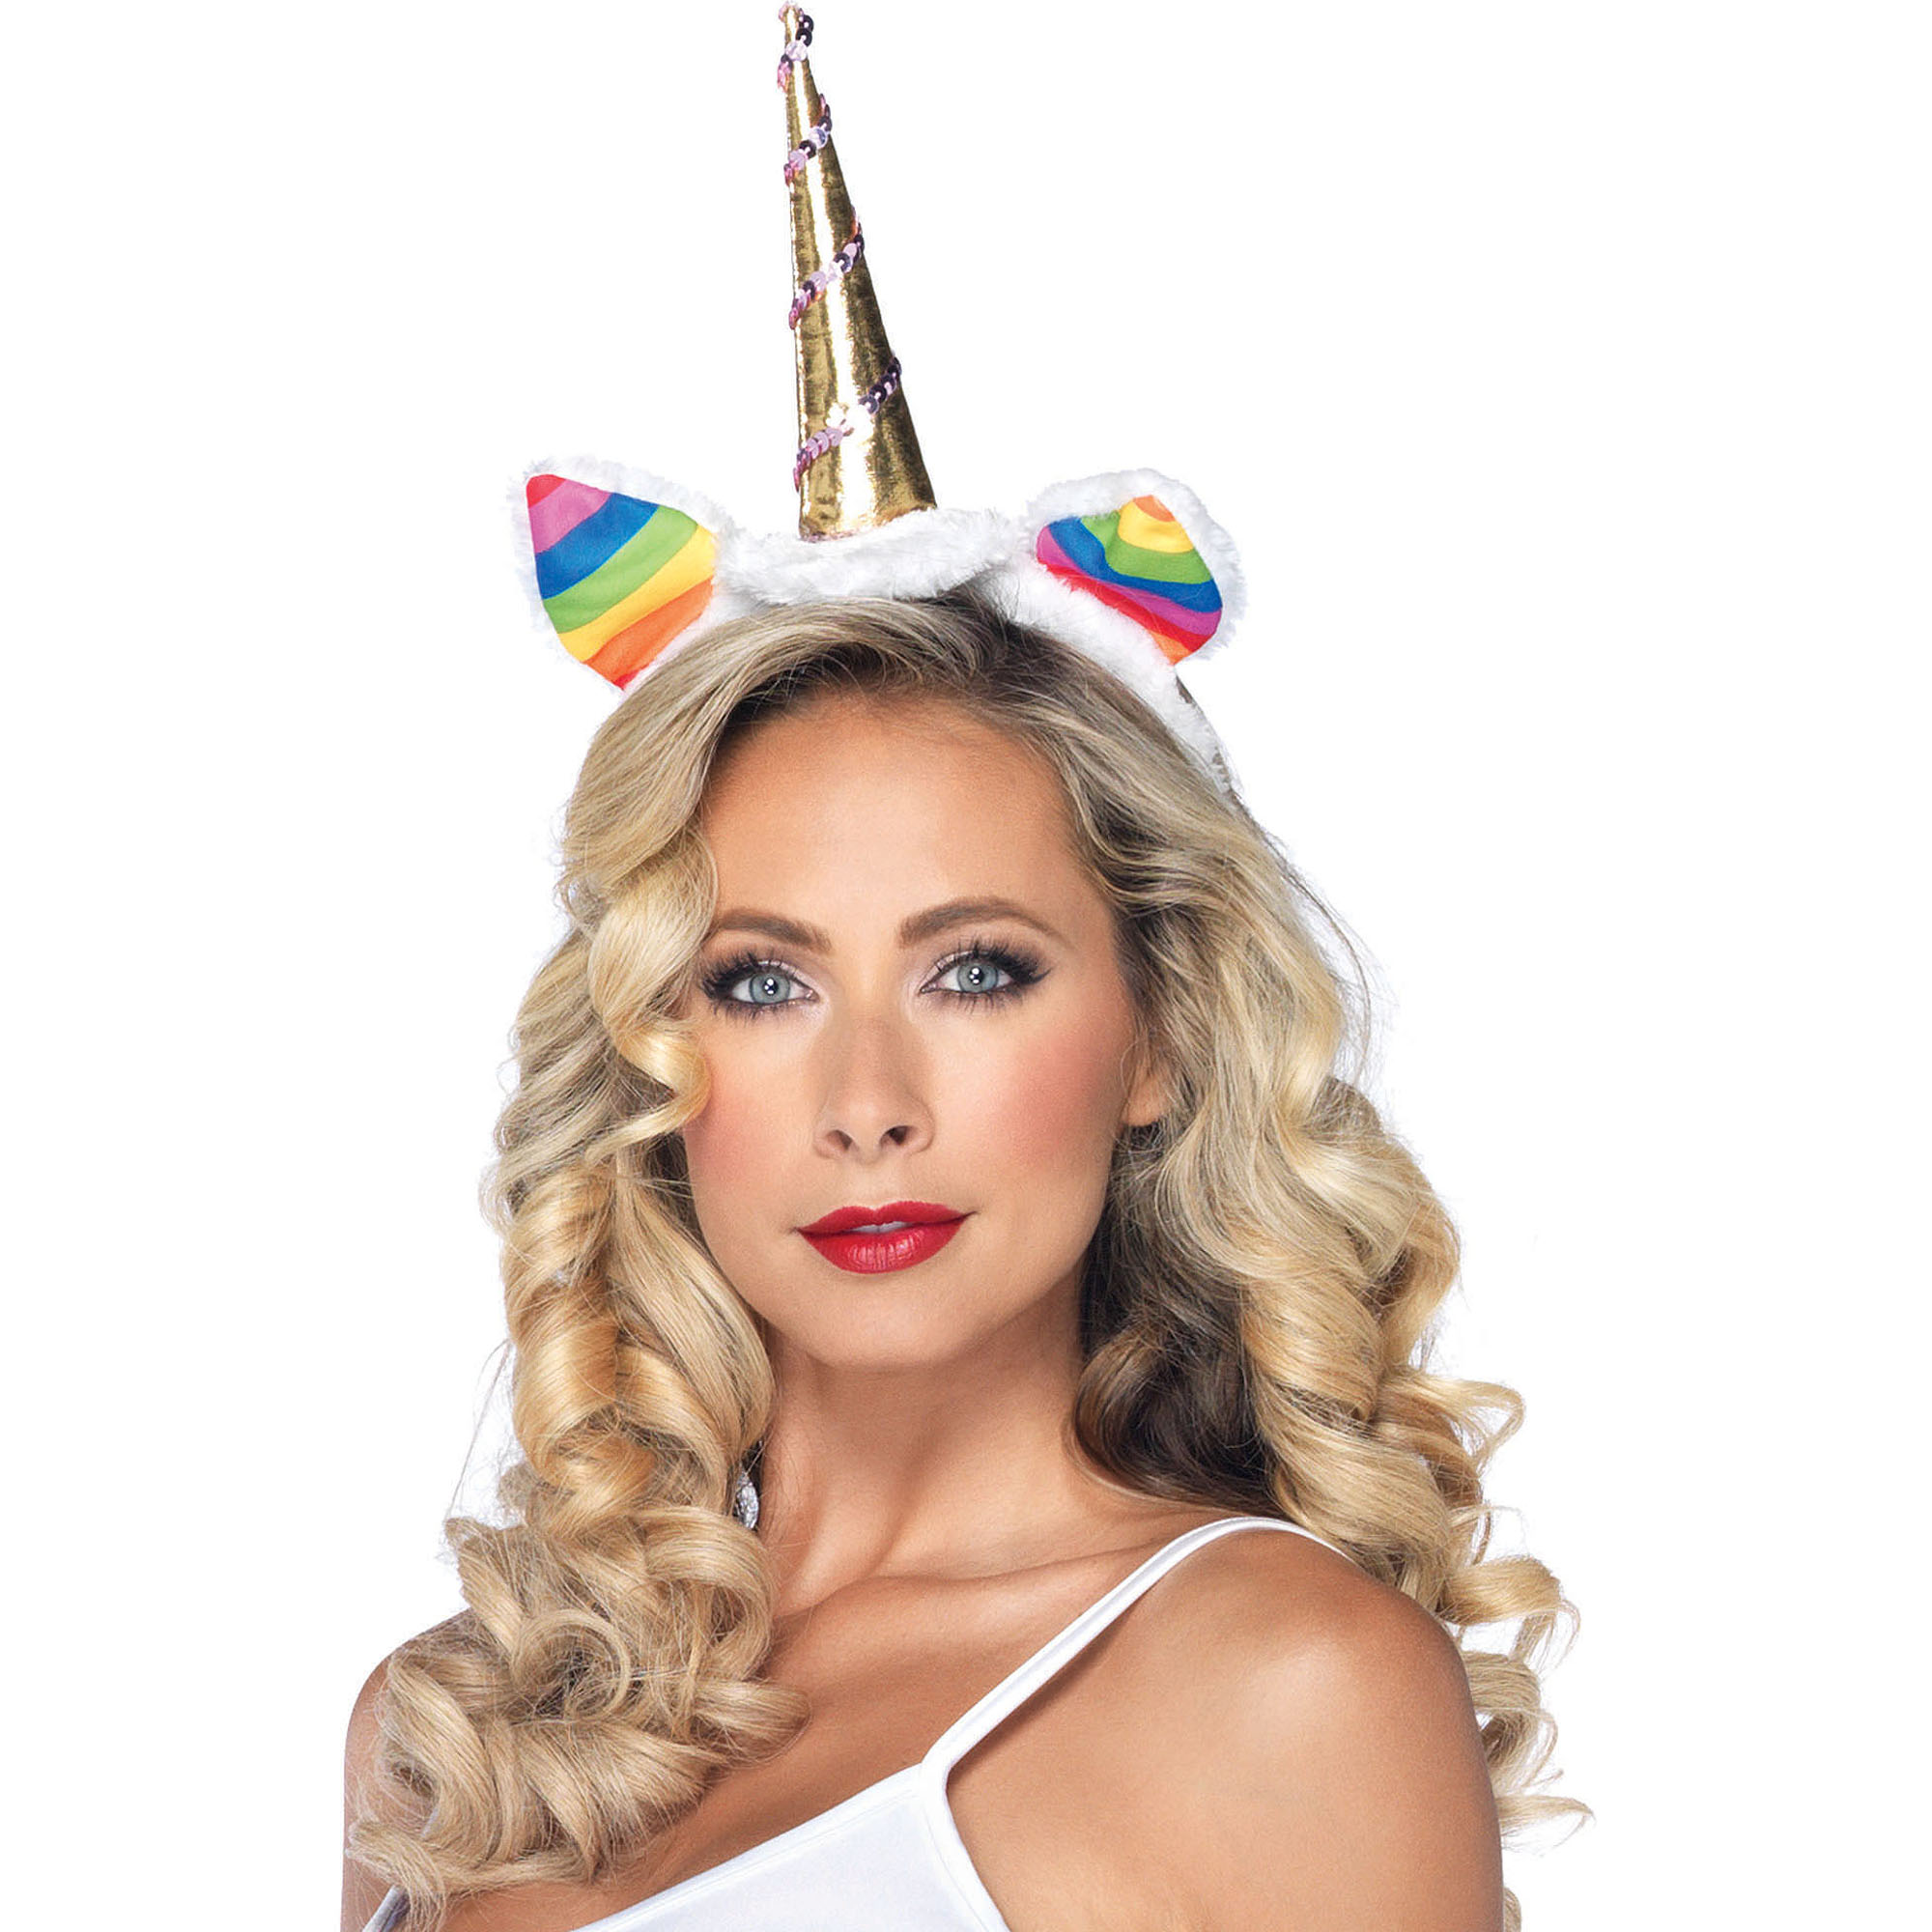 Rainbow Unicorn Headband Adult Halloween Costume